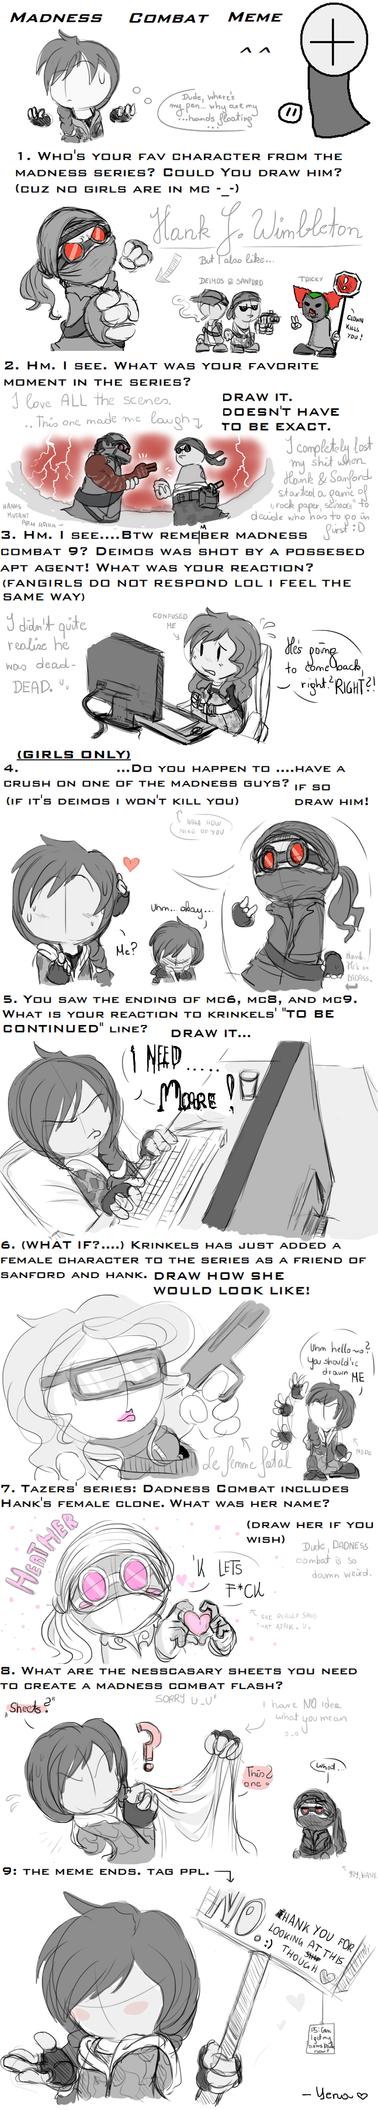 Madness Combat Meme by Nighttame